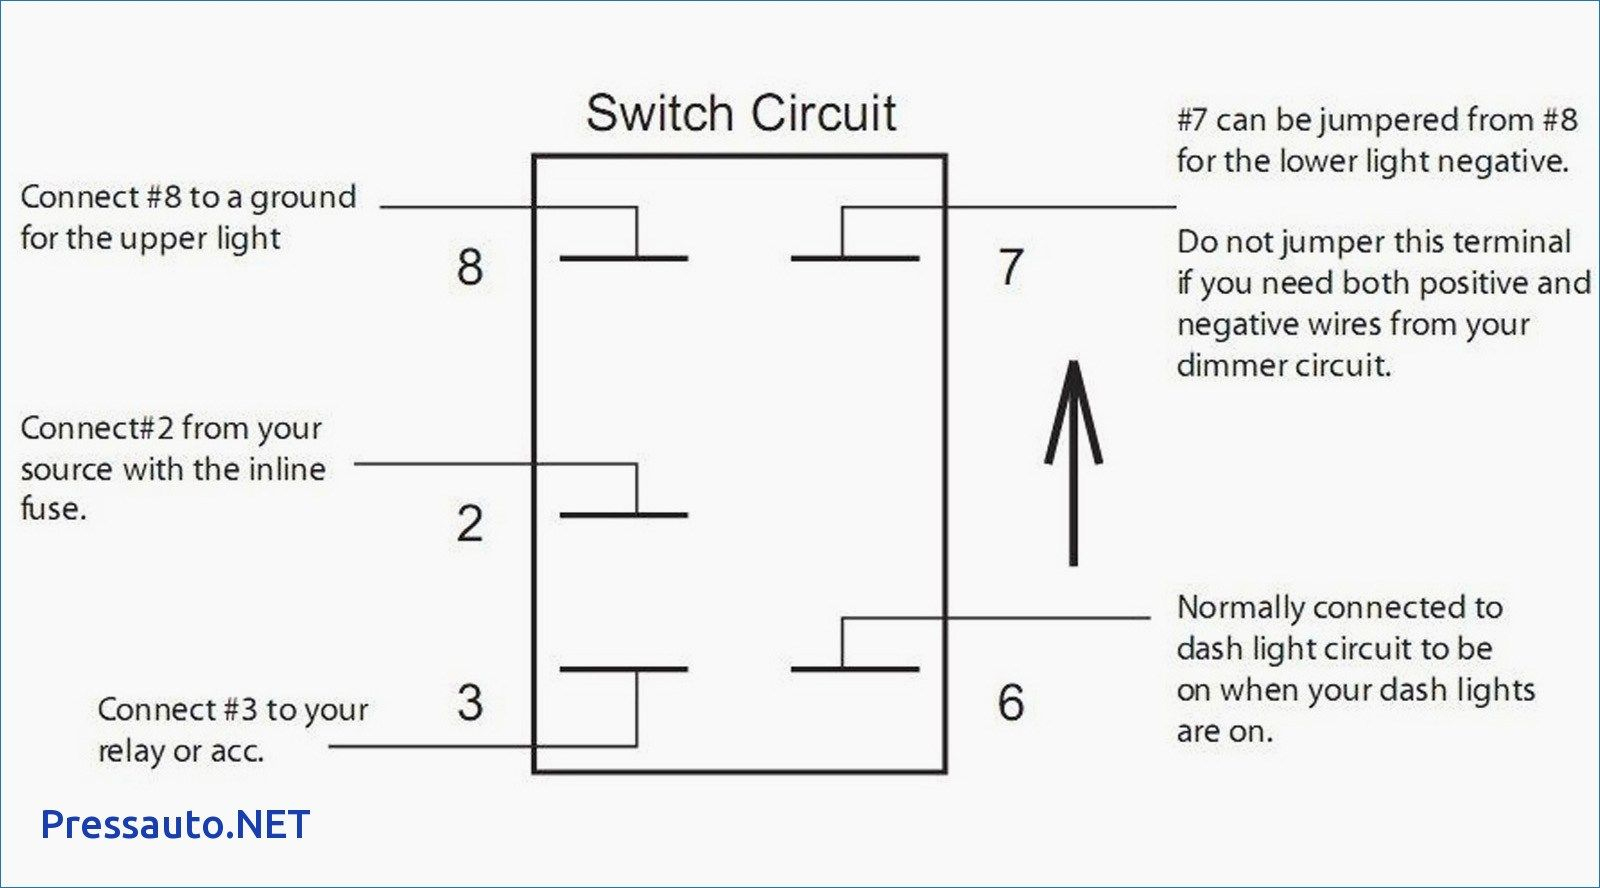 Ac Rocker Switch Wiring - Data Wiring Diagram Today - 3 Position Toggle Switch Wiring Diagram